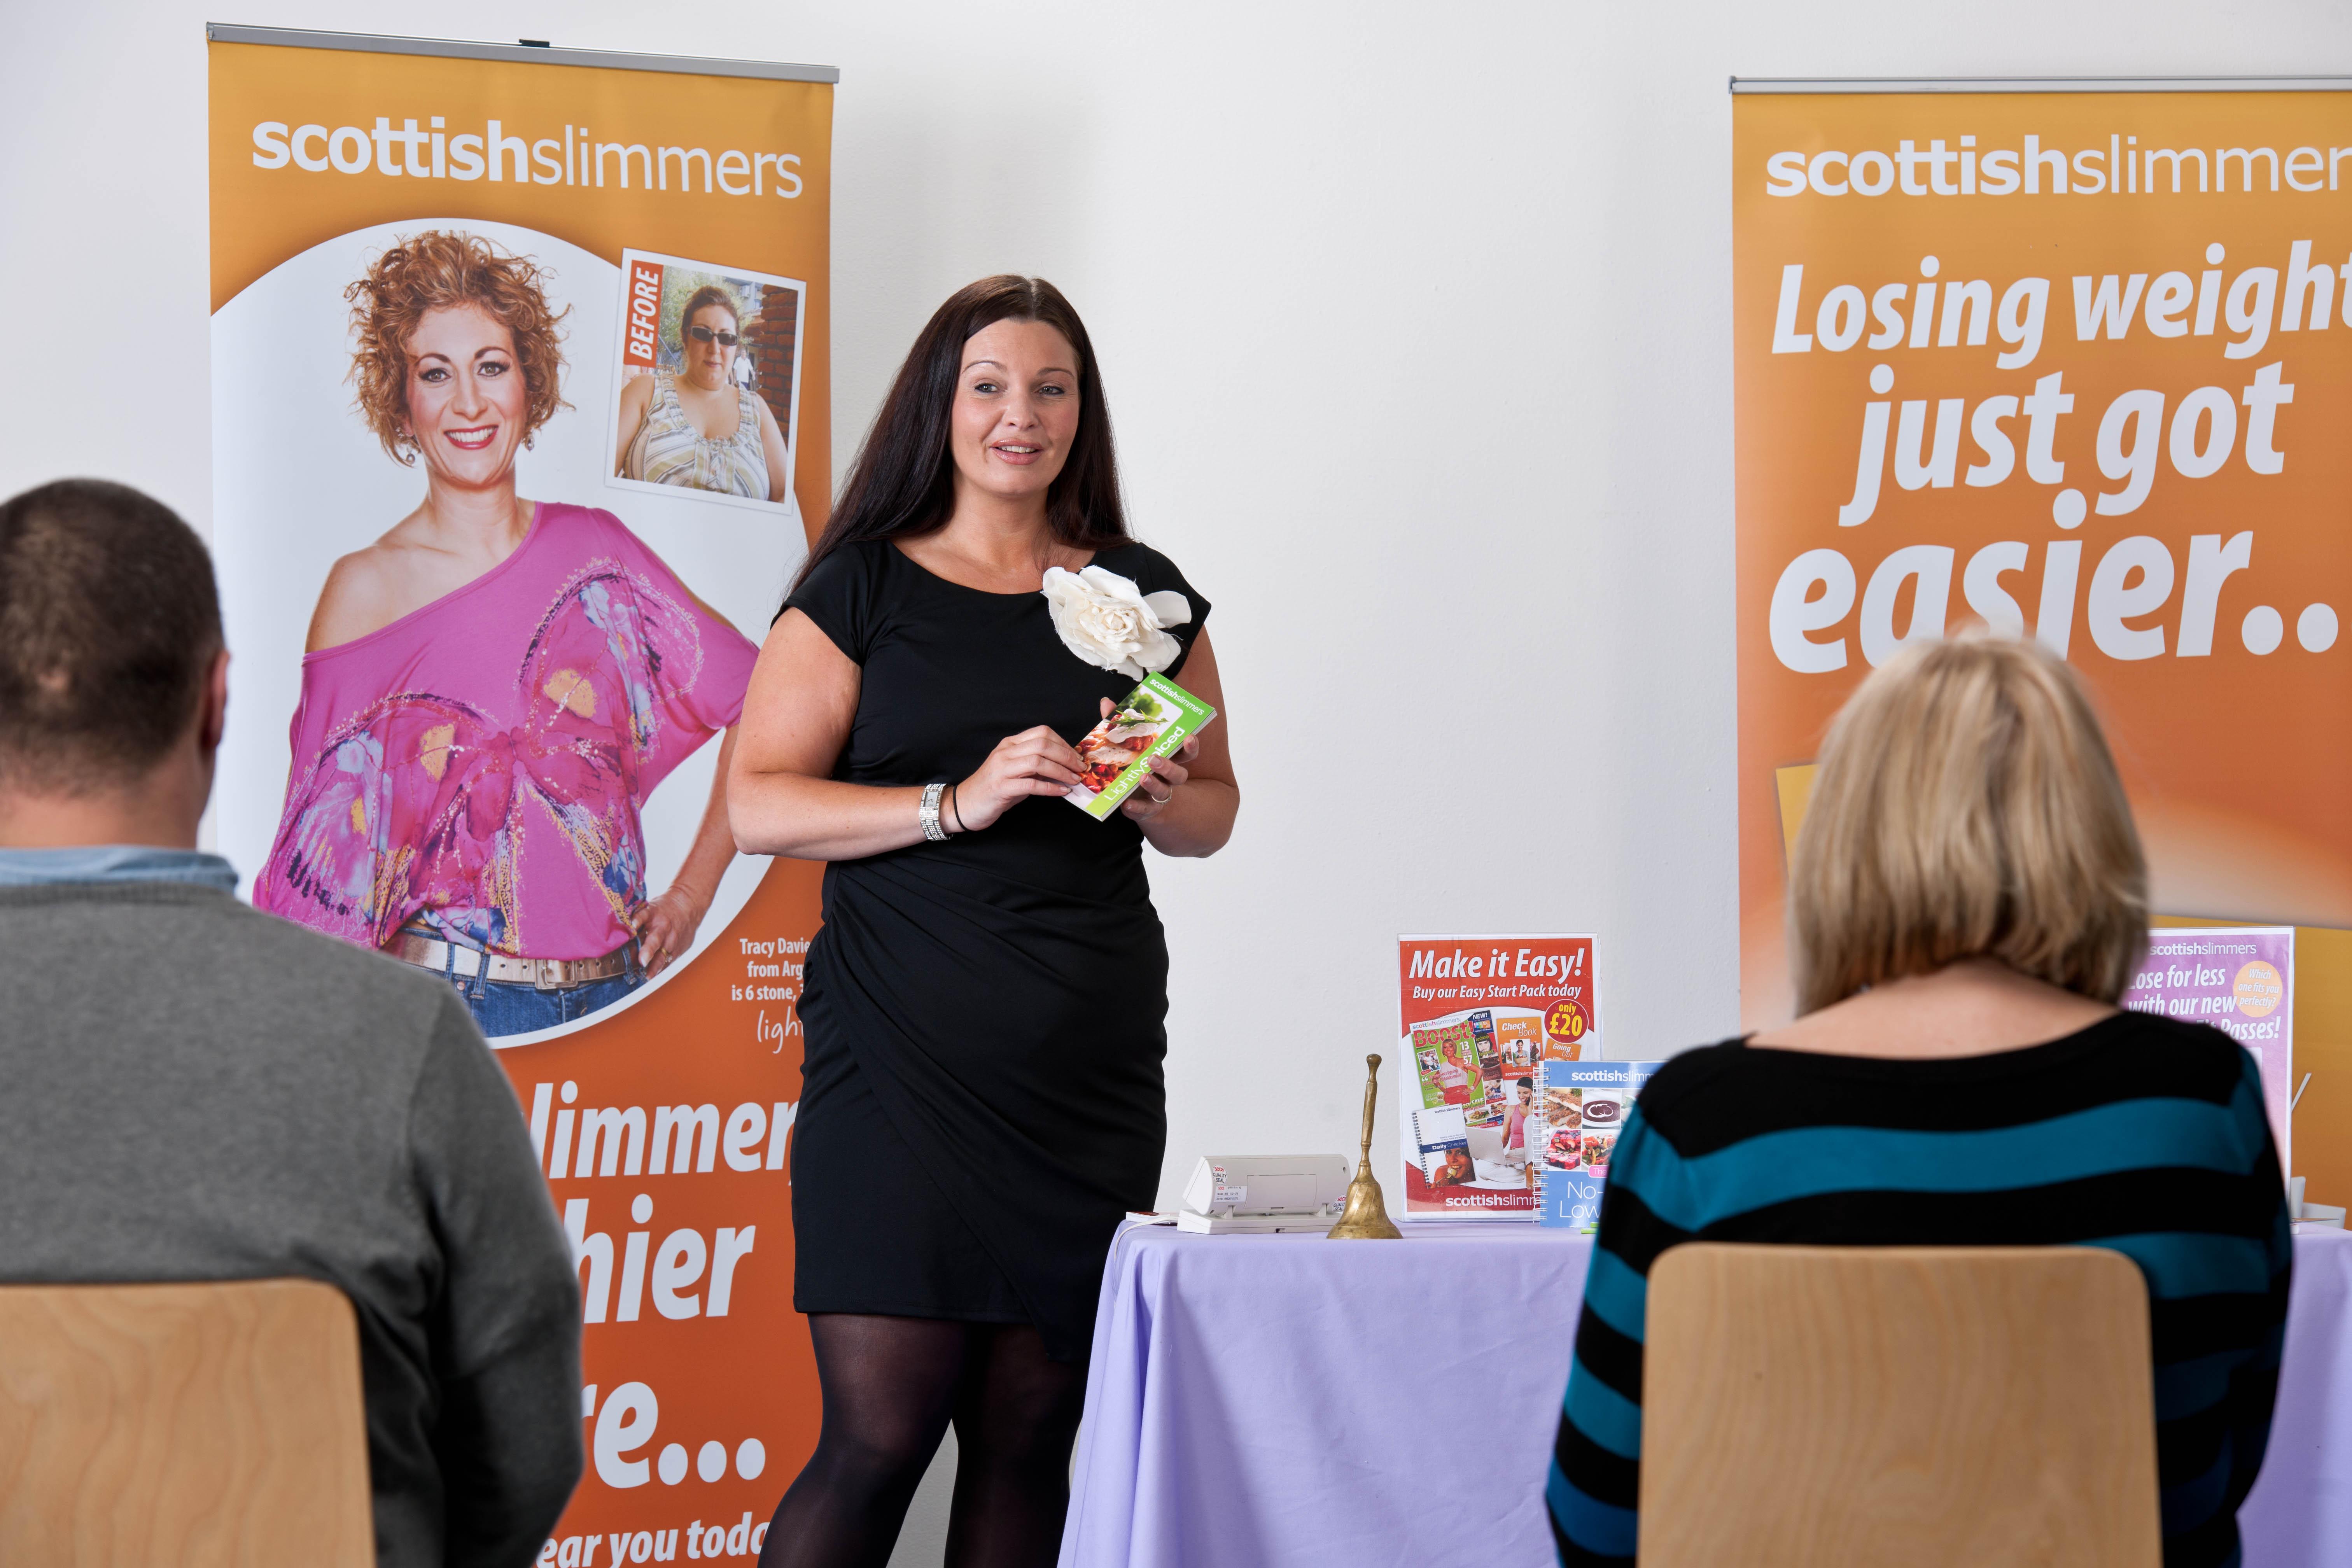 Scottish Slimmers has gone into liquidation